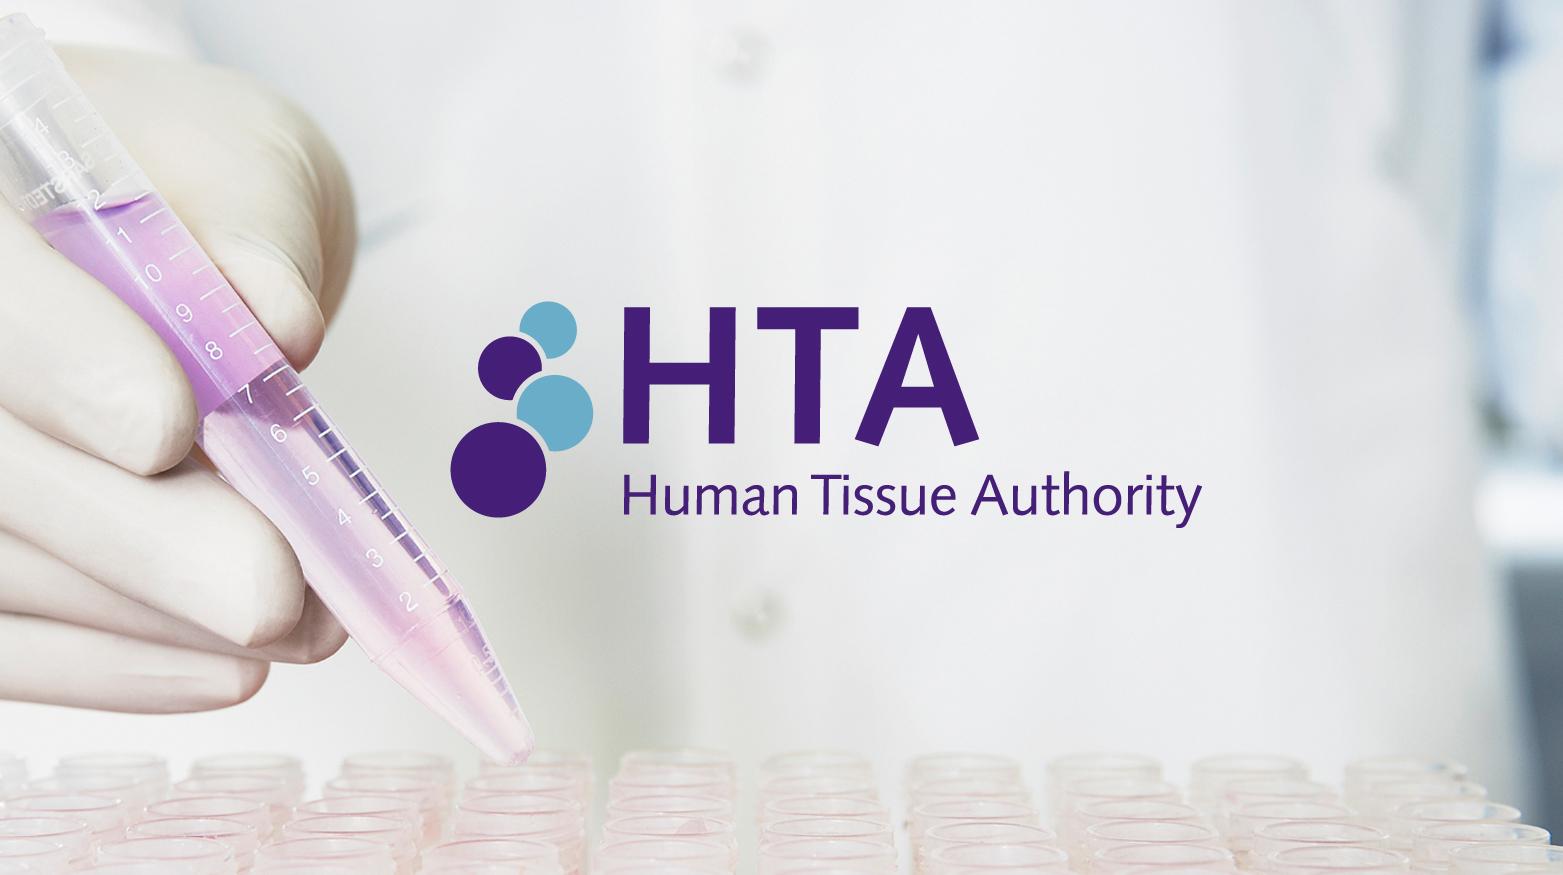 HTA logo displayed over a white coat lab image